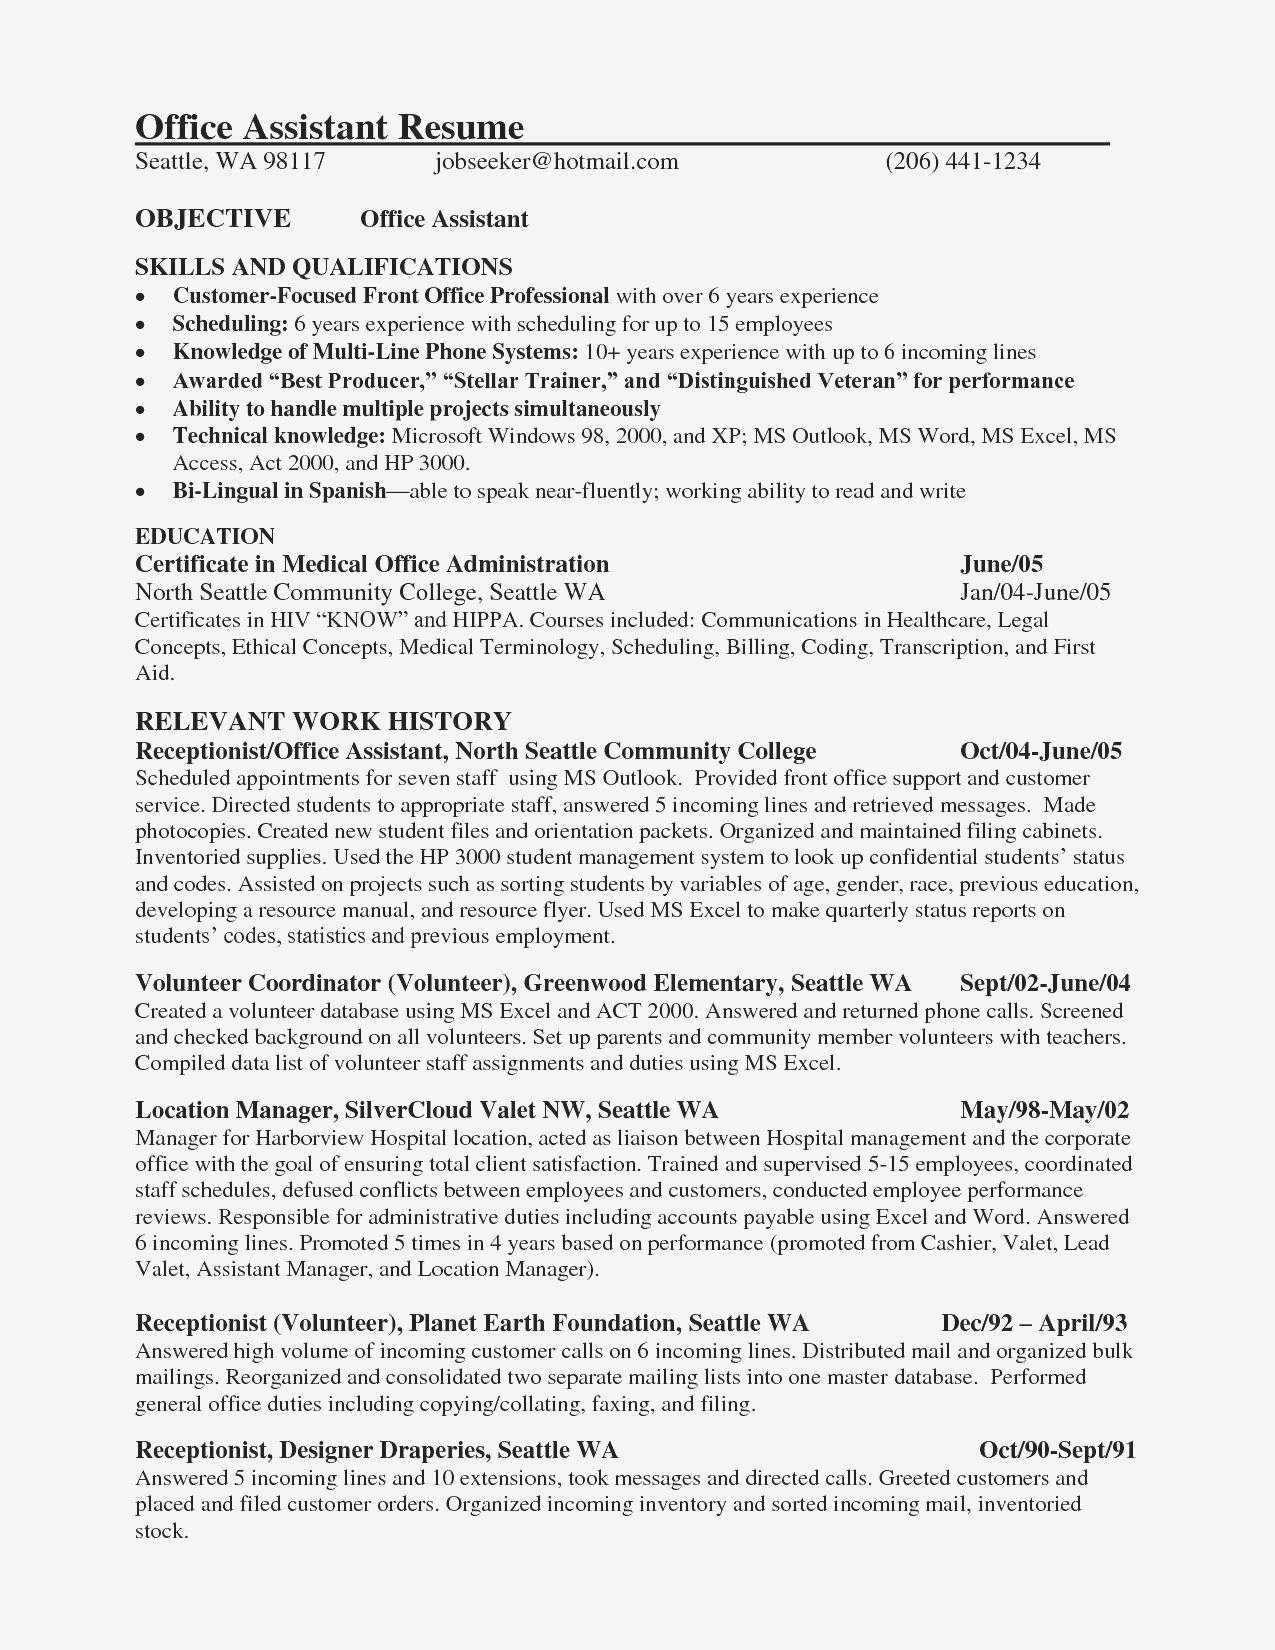 30 Assistant Manager Resume Sample Medical Assistant Resume